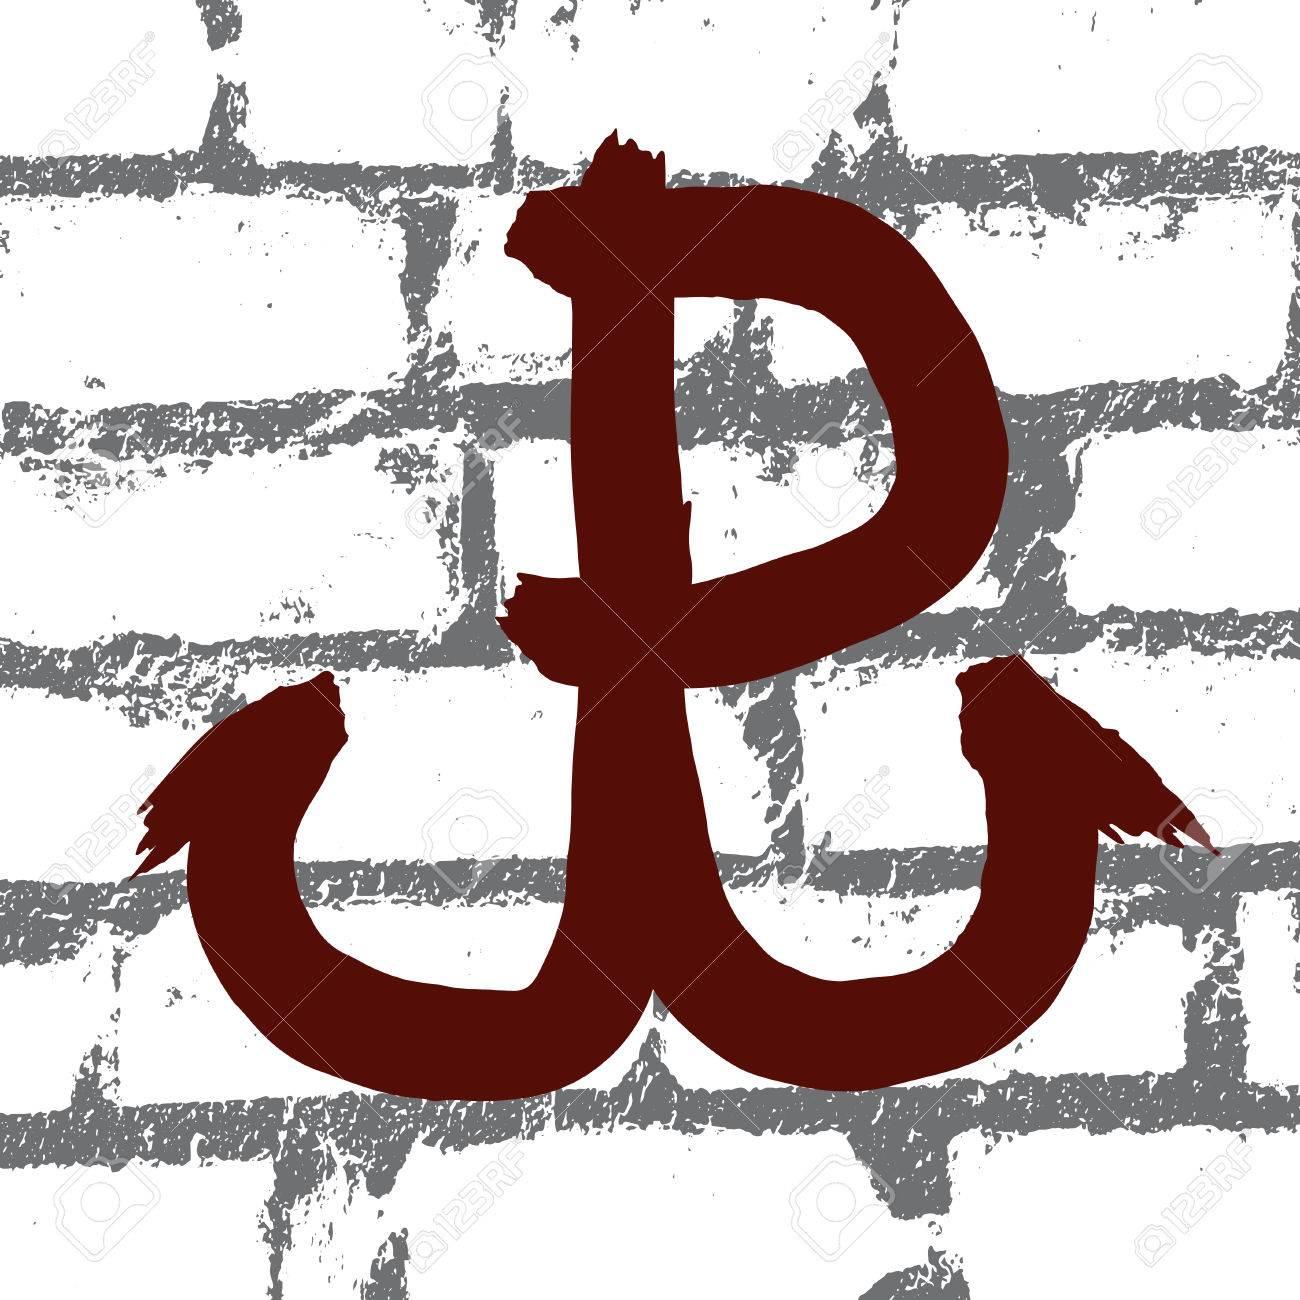 Poland fights (Polska walczy), symbol of Polish resistance movement during World War II isolated on white background. - 62196775